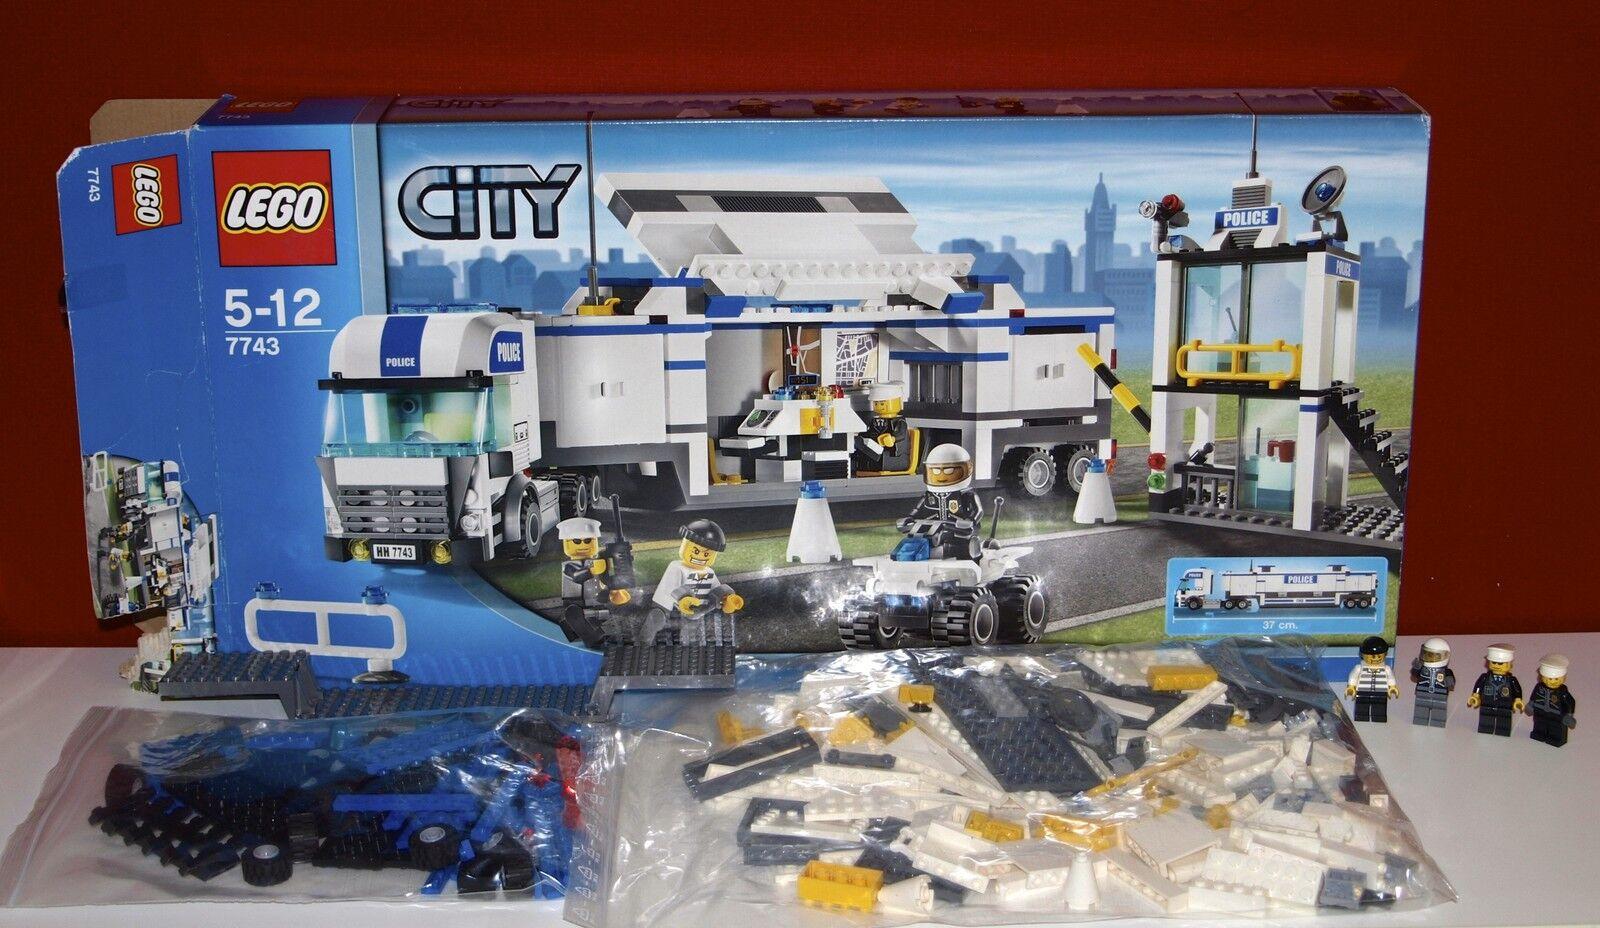 Lego City 7743 Police Command Center, Überwachungswagen, OBA, OVP, BOX, TOP